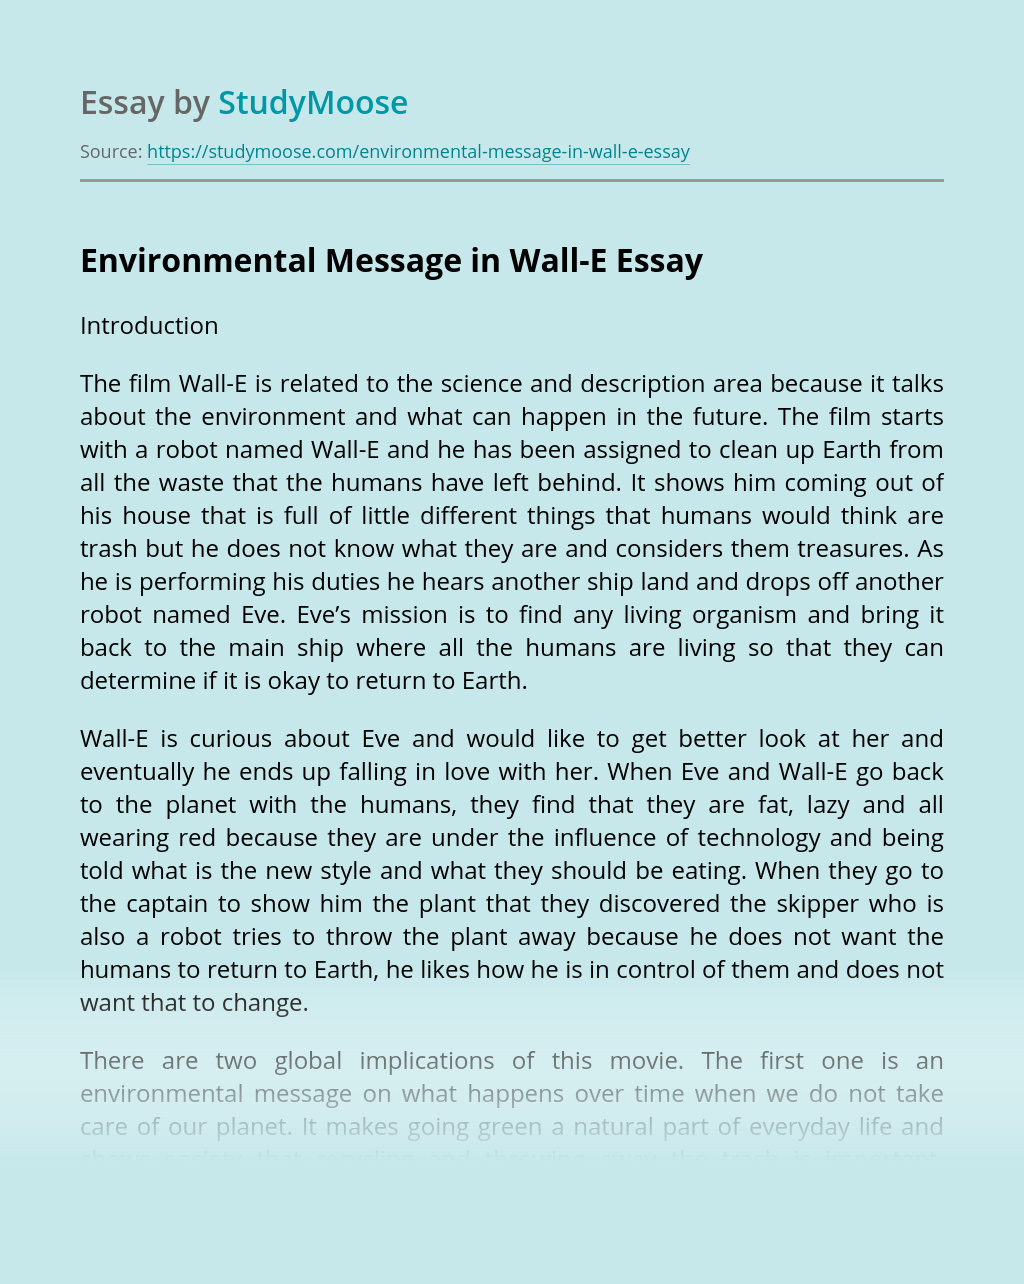 Environmental Message in Wall-E